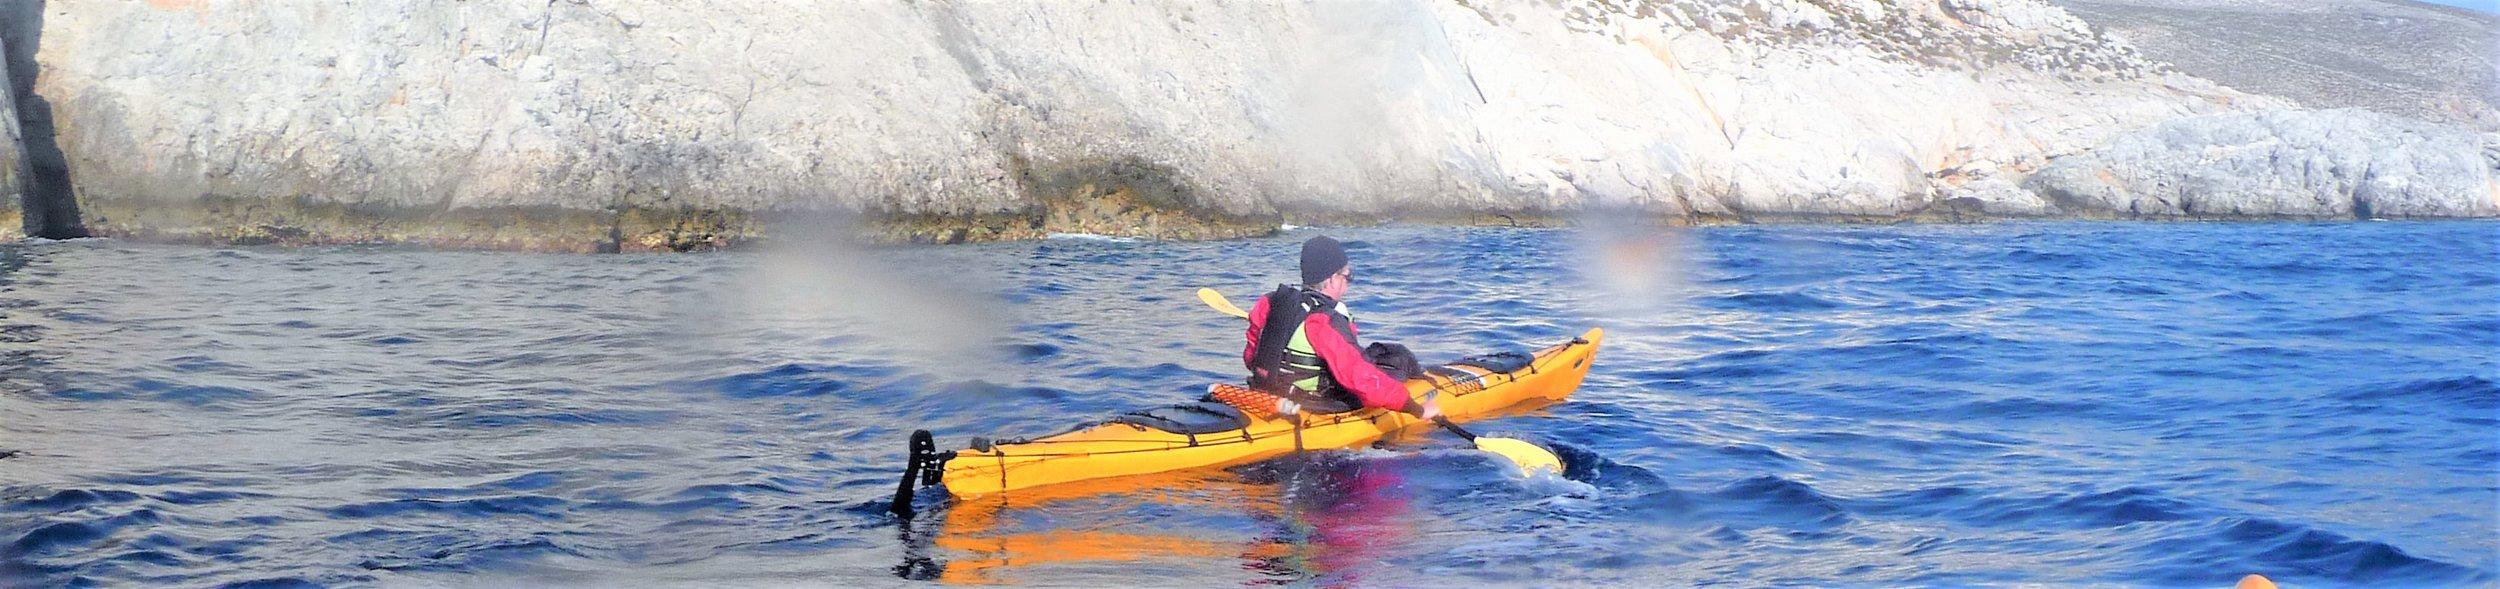 kayaking off Kalymnos, Greek Islands